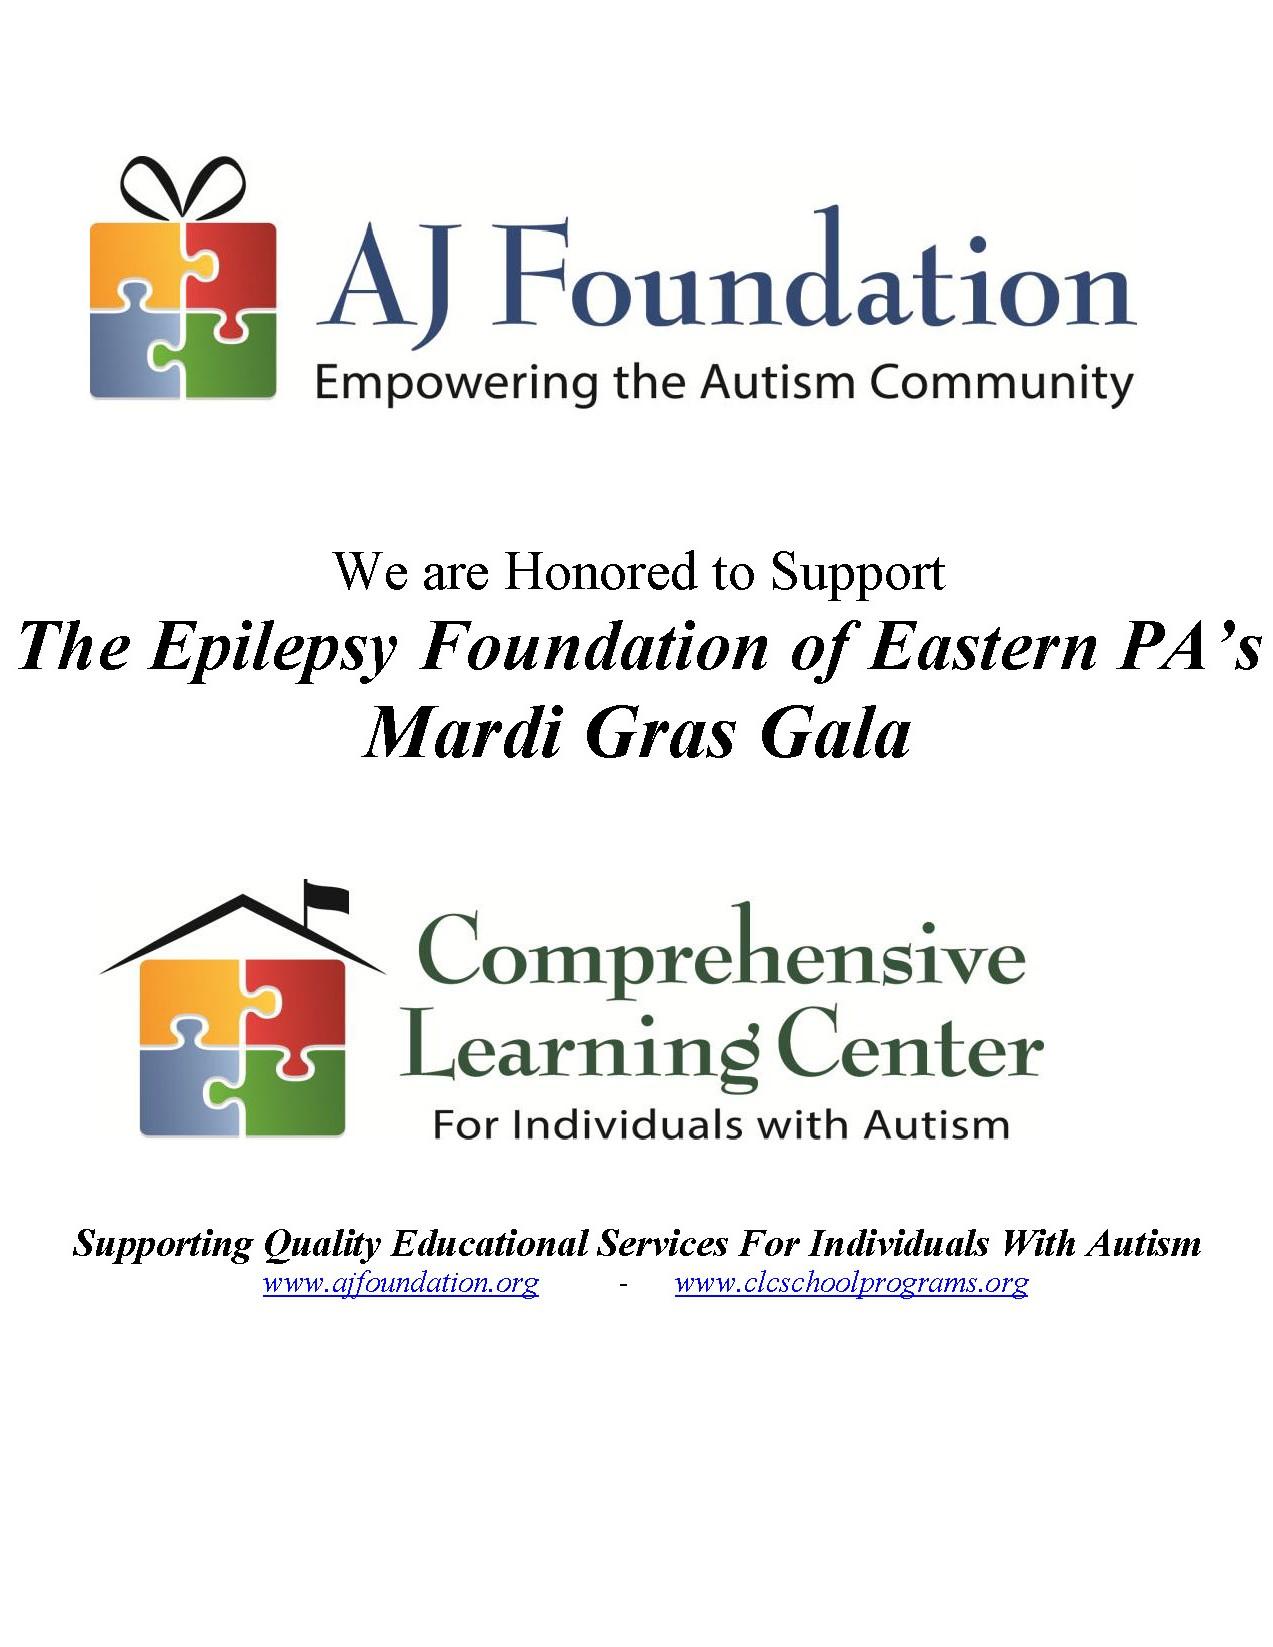 AJ Foundation